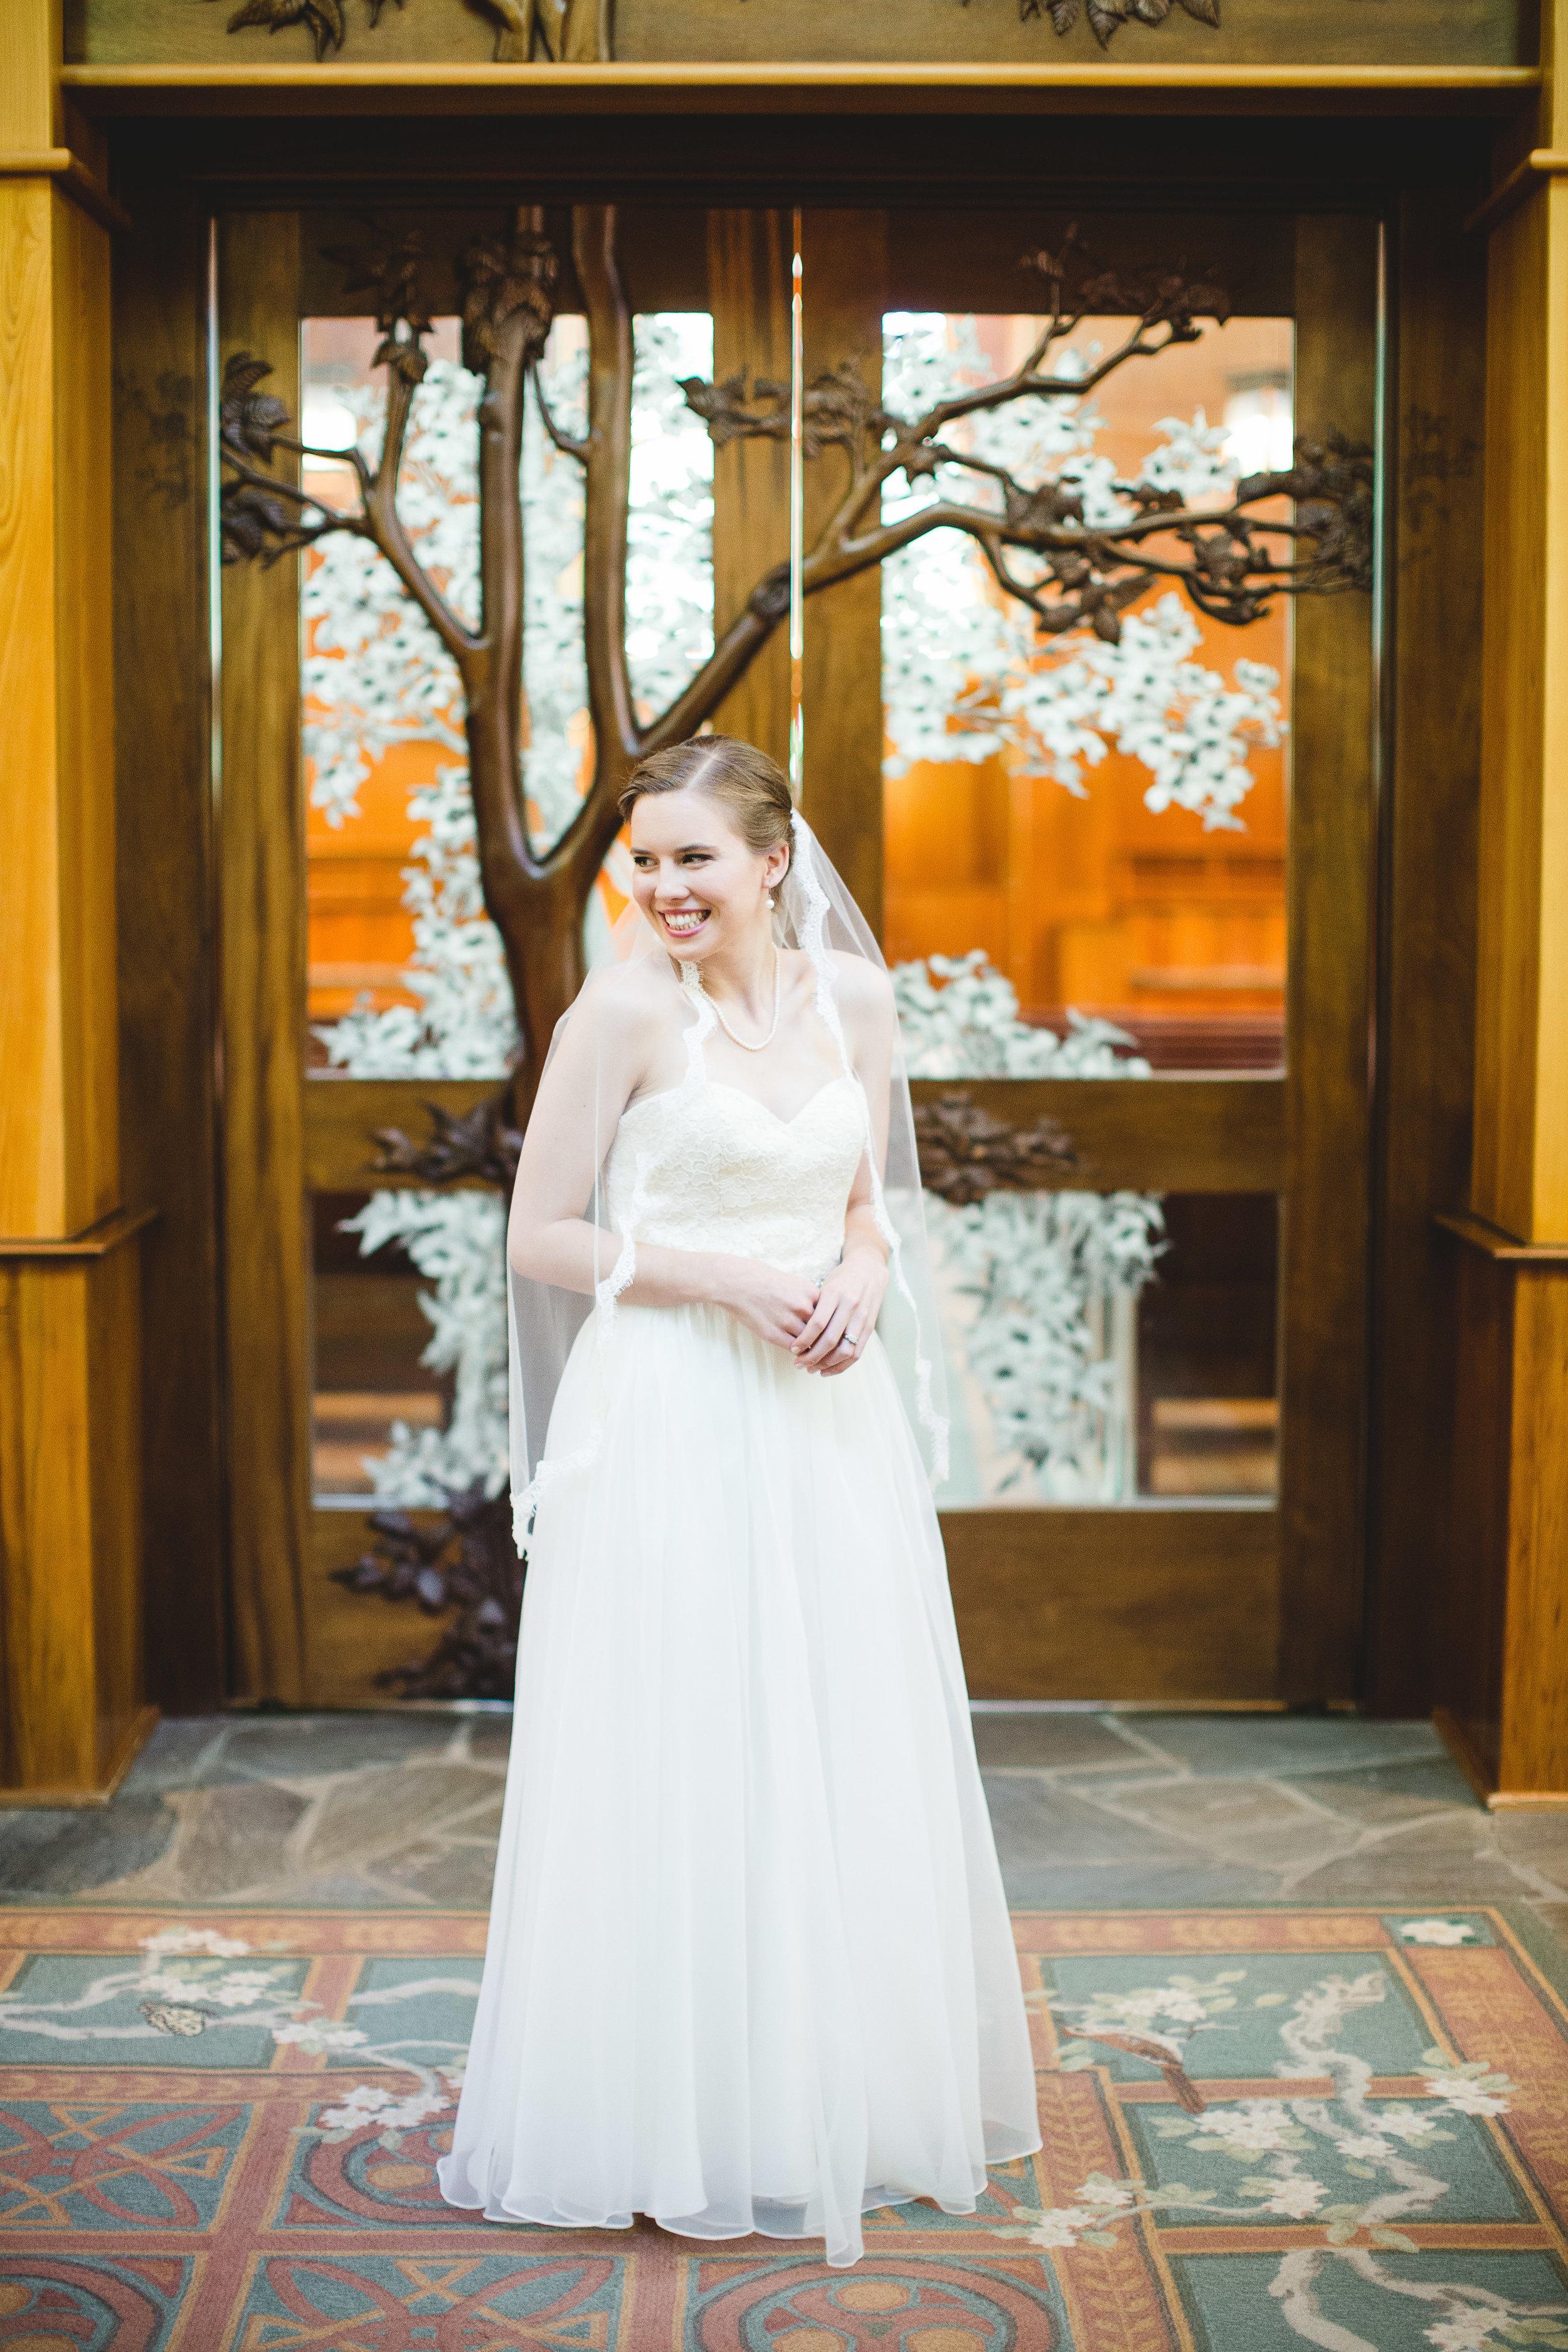 ivory-and-beau-bridal-boutique-savannah-bridal-shop-savannah-wedding-gown-sample-sale-savannah-wedding-dress-savannah-sample-sale-bridal-shop-bridal-boutique-savannah.jpg